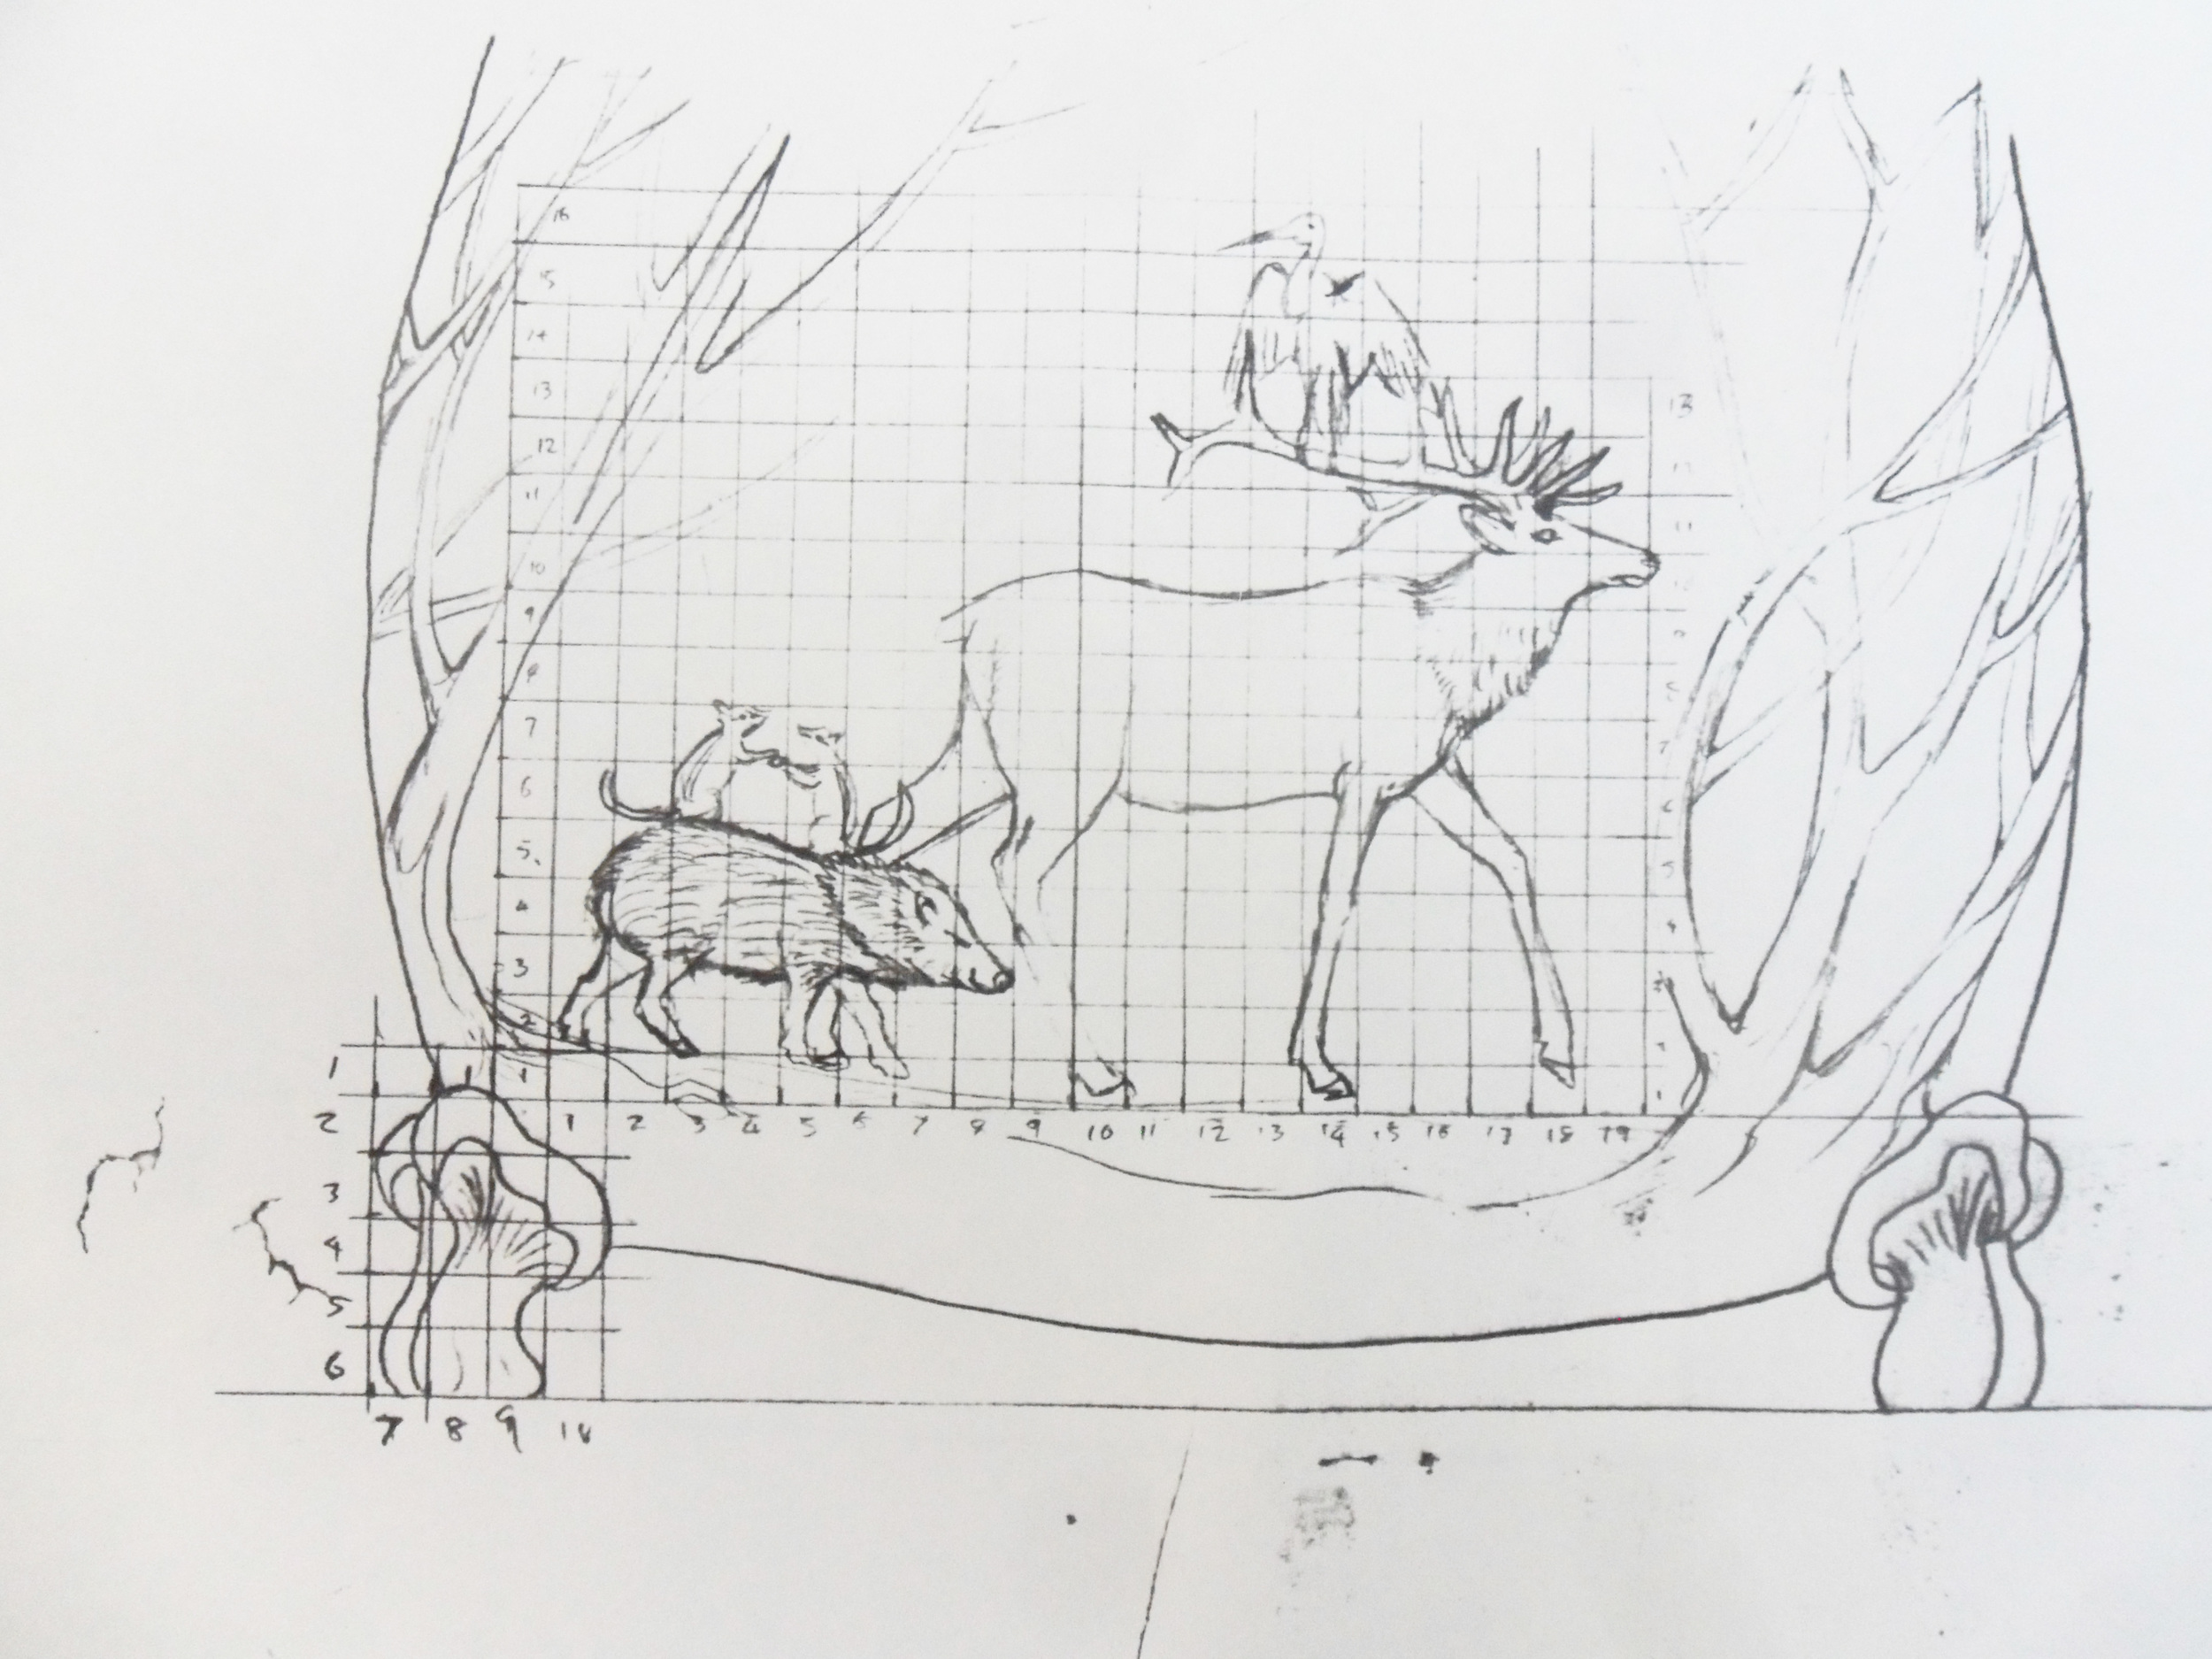 Sketch by Martin Pierce of Martin Pierce Hardware Los Angeles CA 90016